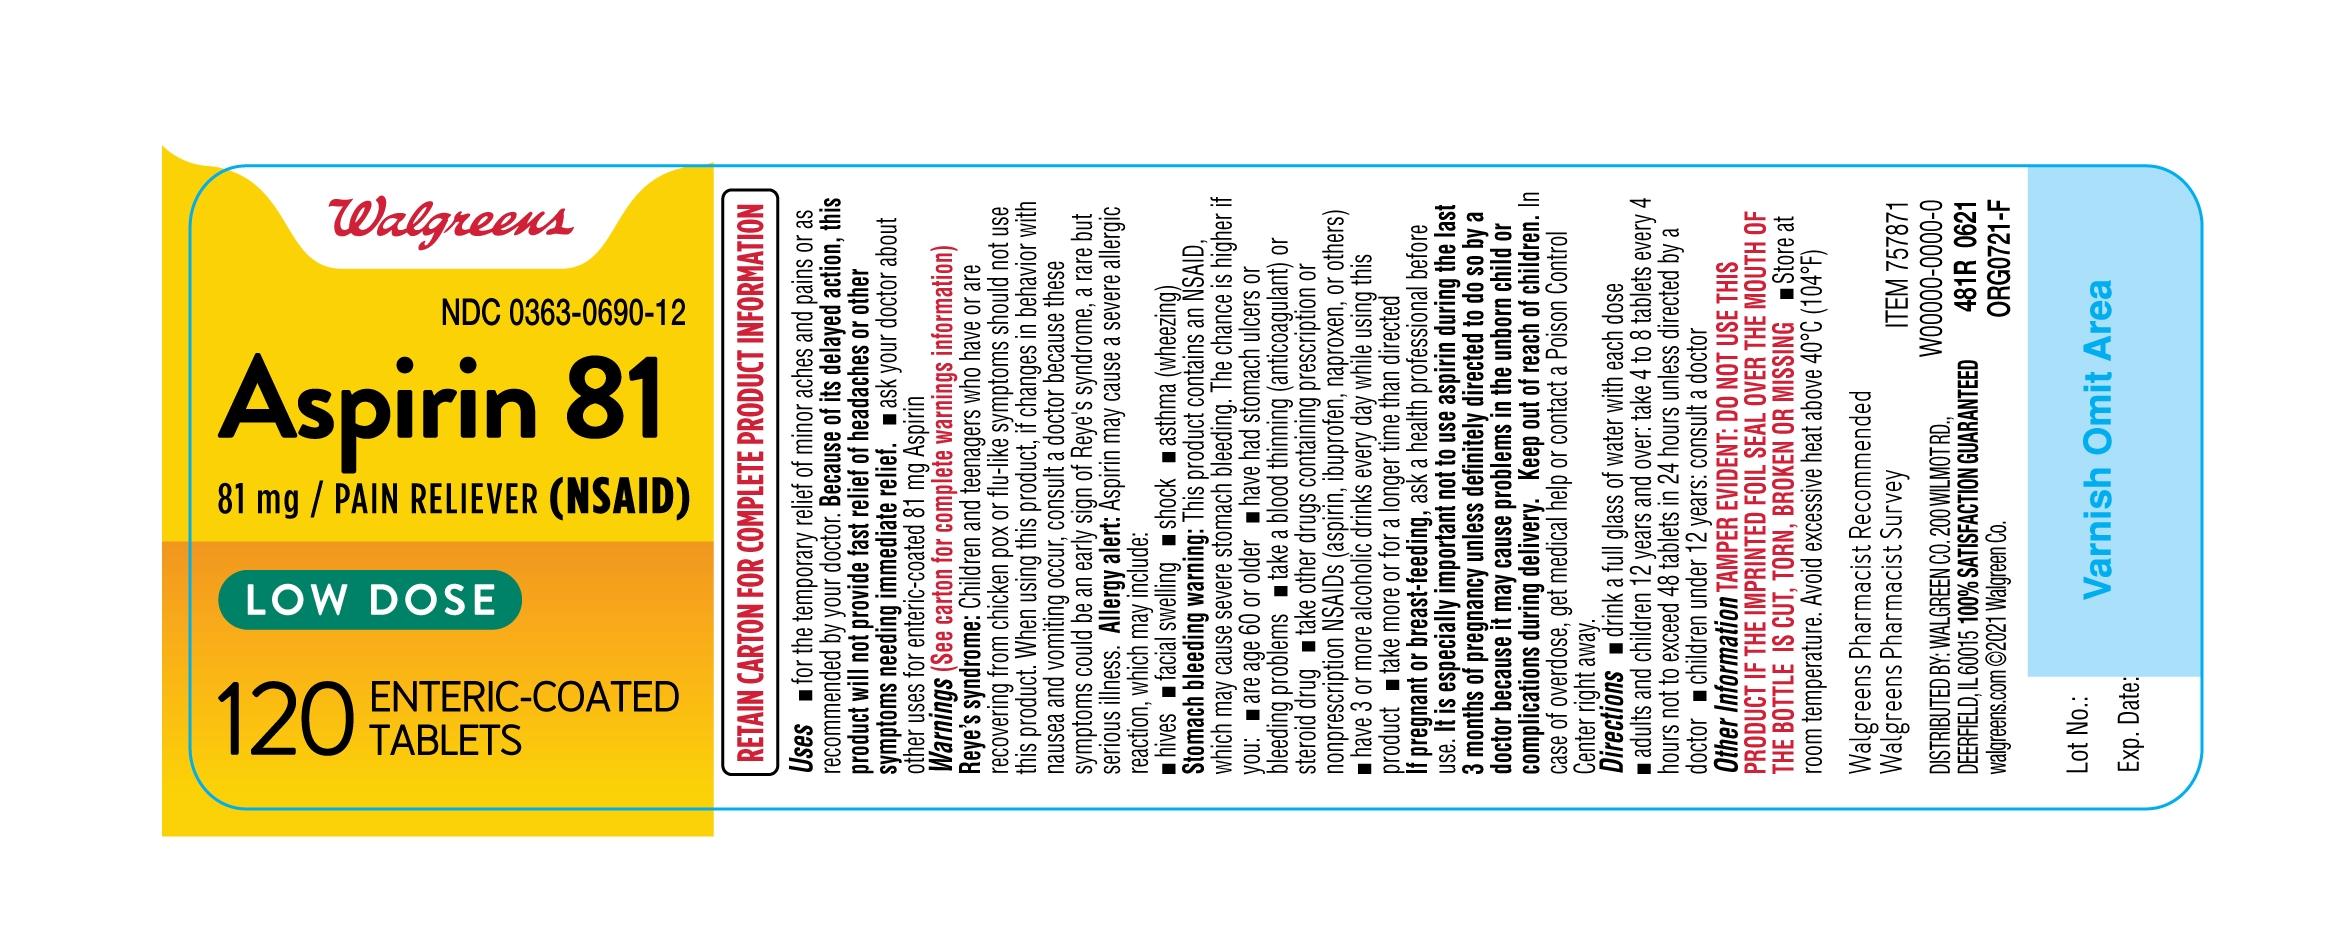 481R-Walgreens-Low Dose Aspirin-bottle label-ct120